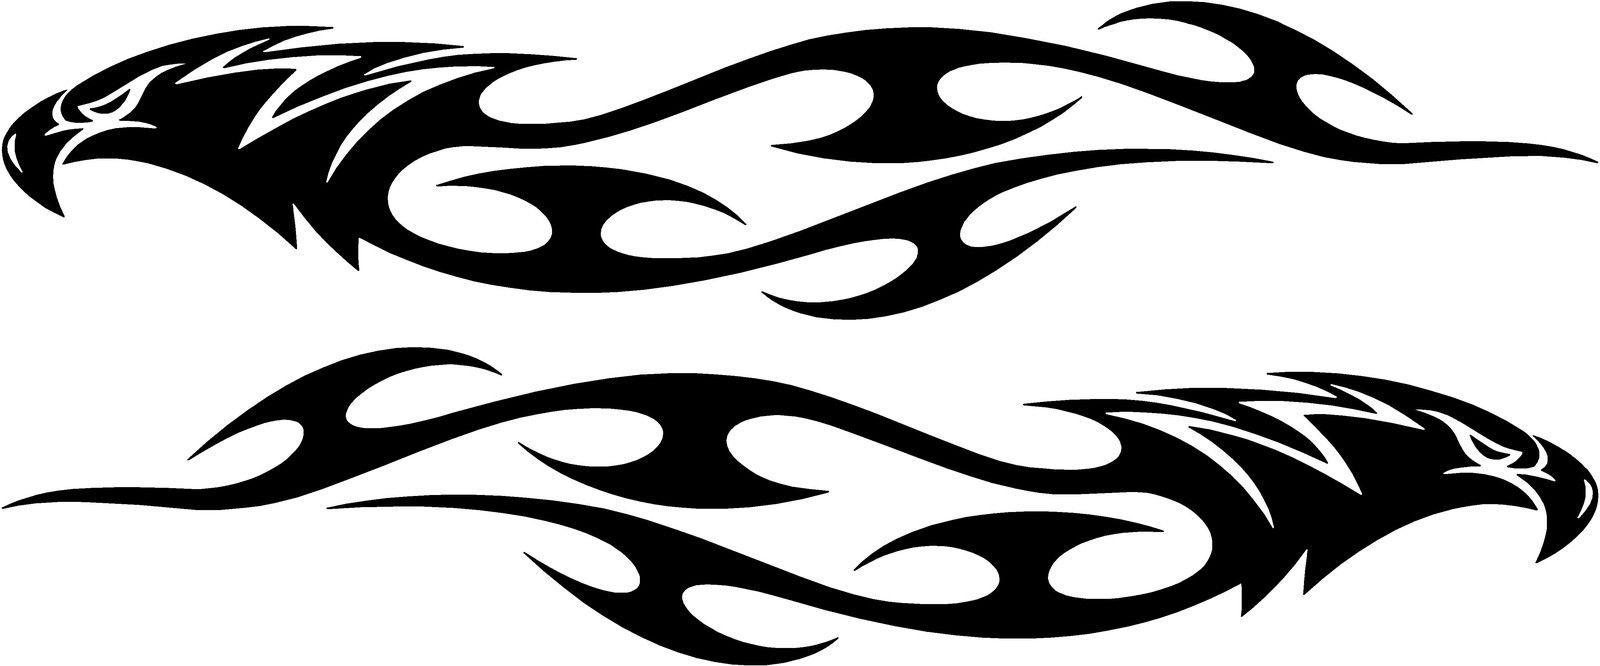 2 5 pair eagle flames tribal decals each is 1 8x9 choose color vinyl sticker ebay home garden